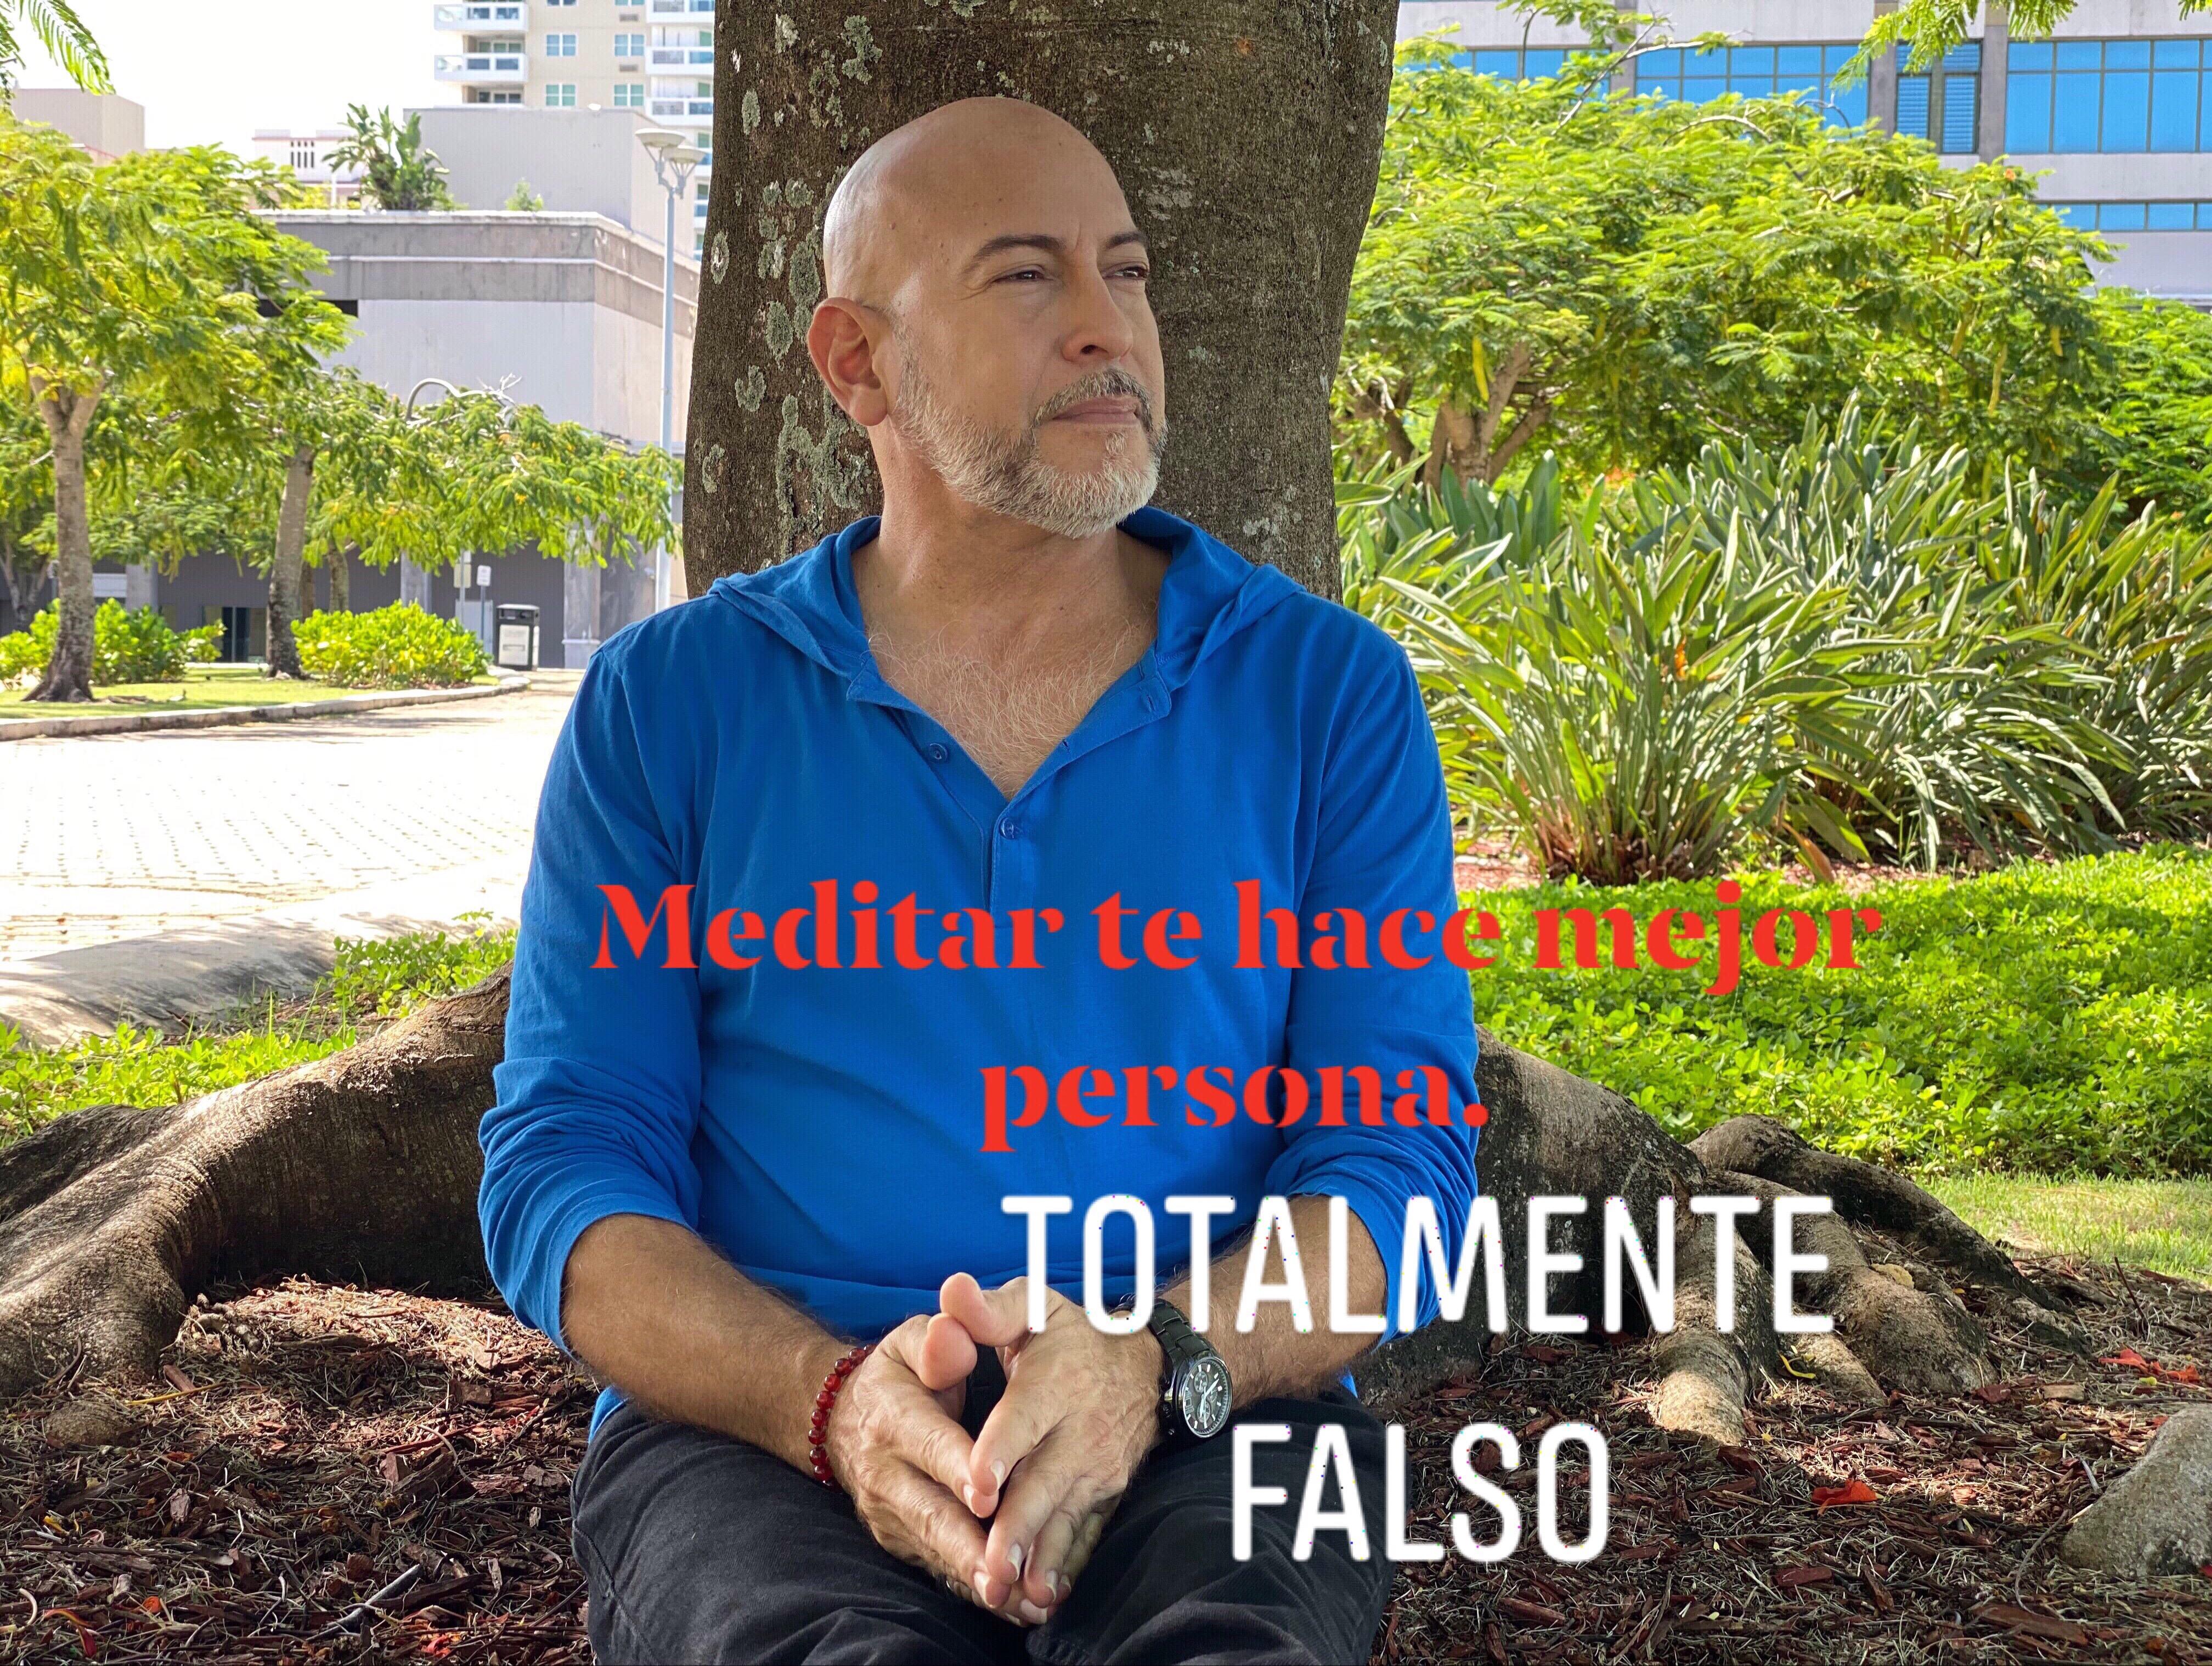 Meditar te hace mejor persona. TOTALMENTE FALSO.